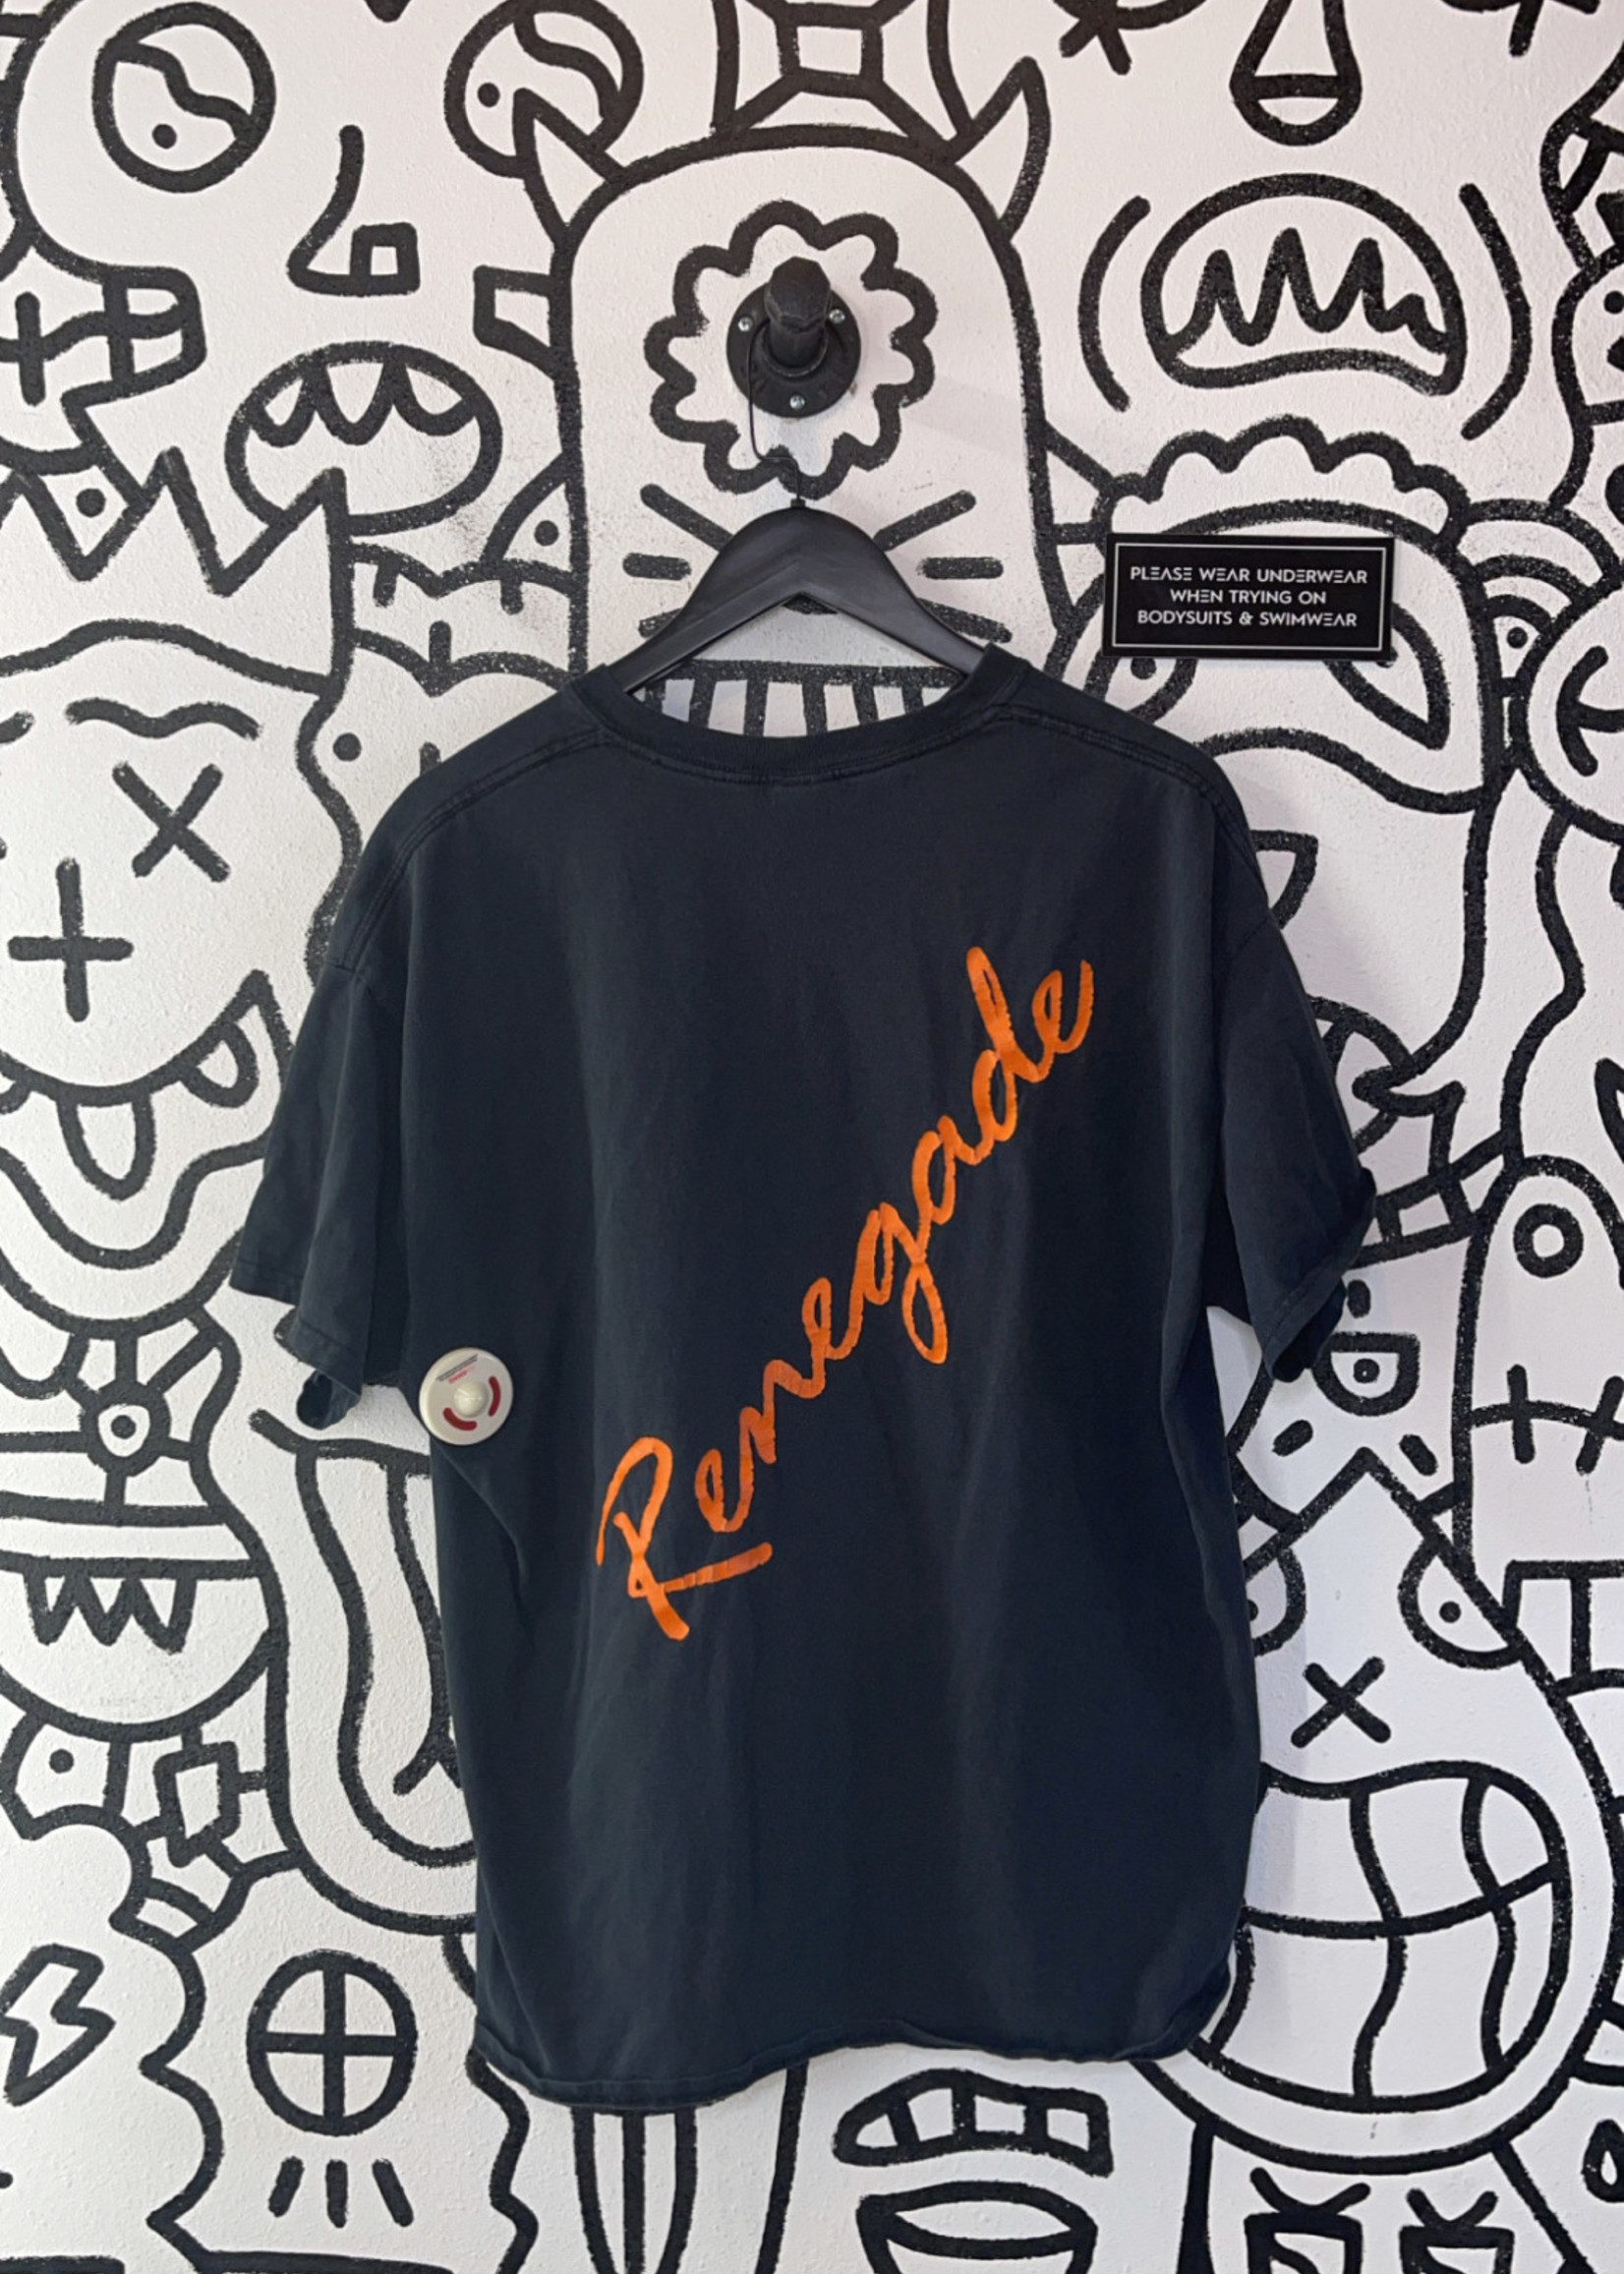 Renegade Black Tee XL